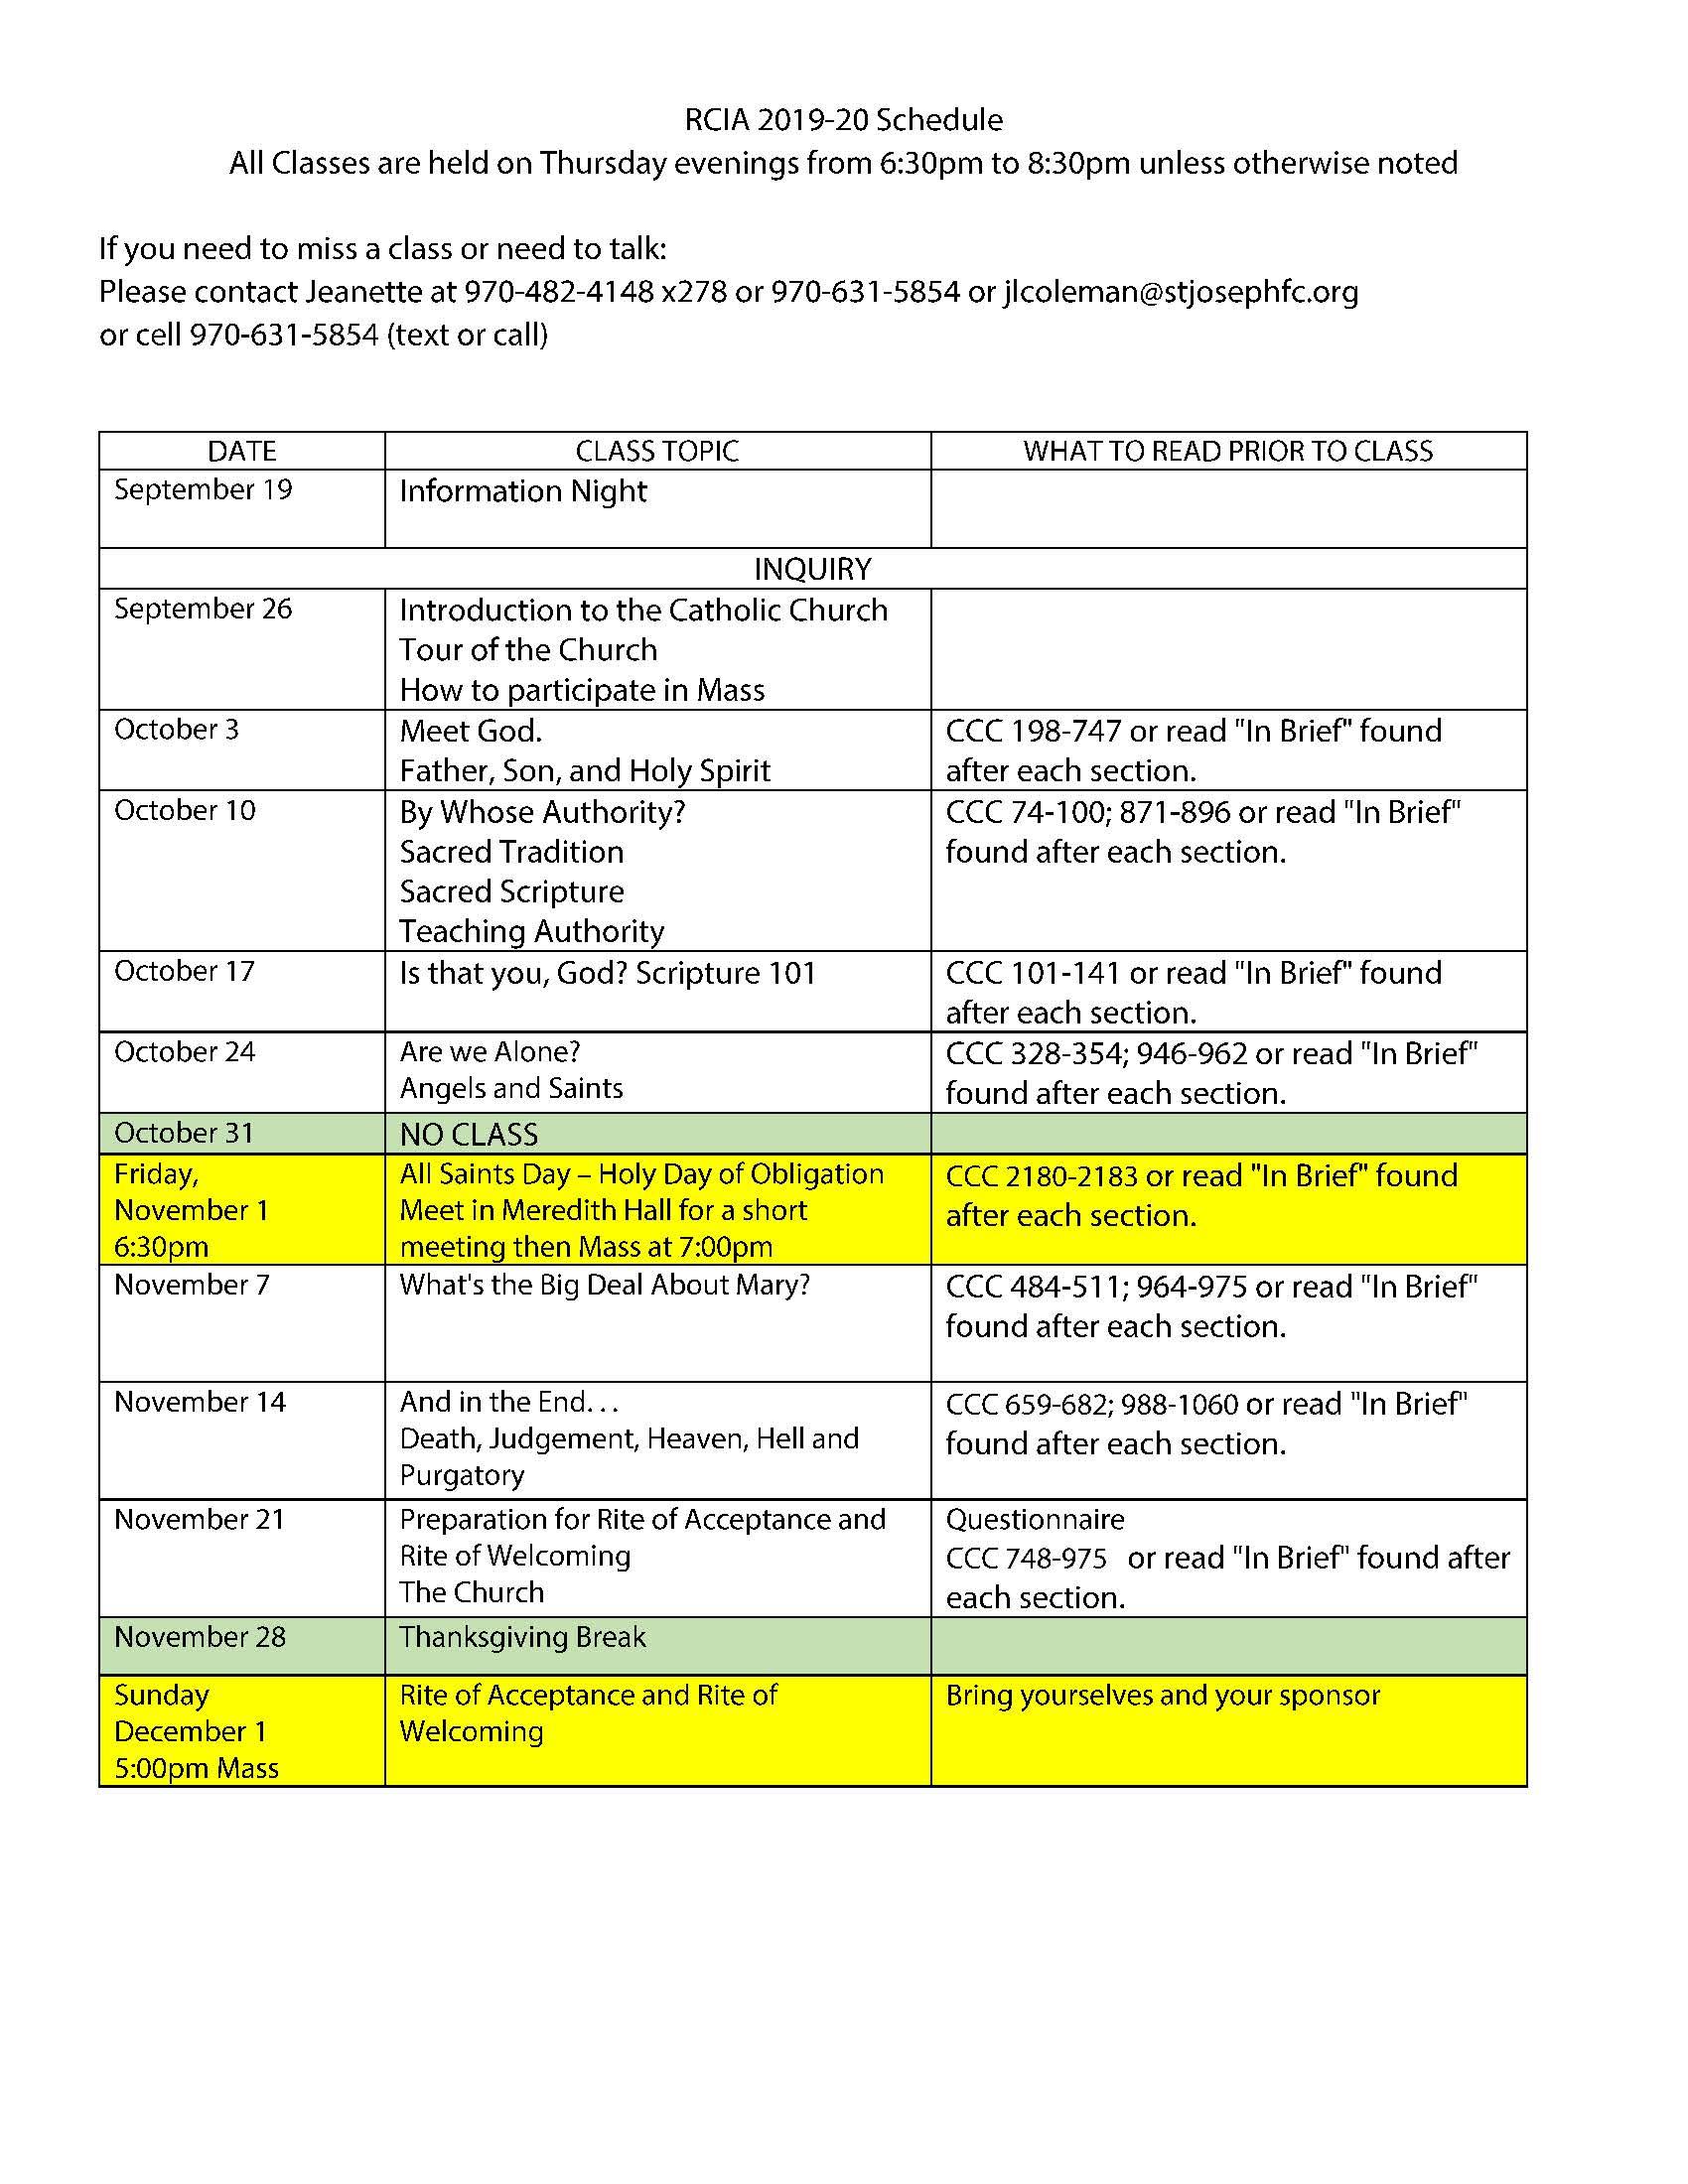 Rcia Schedule 2019-2020 - Saint Joseph Catholic Church regarding 2020 Catholic Liturgical Calendar Pdf